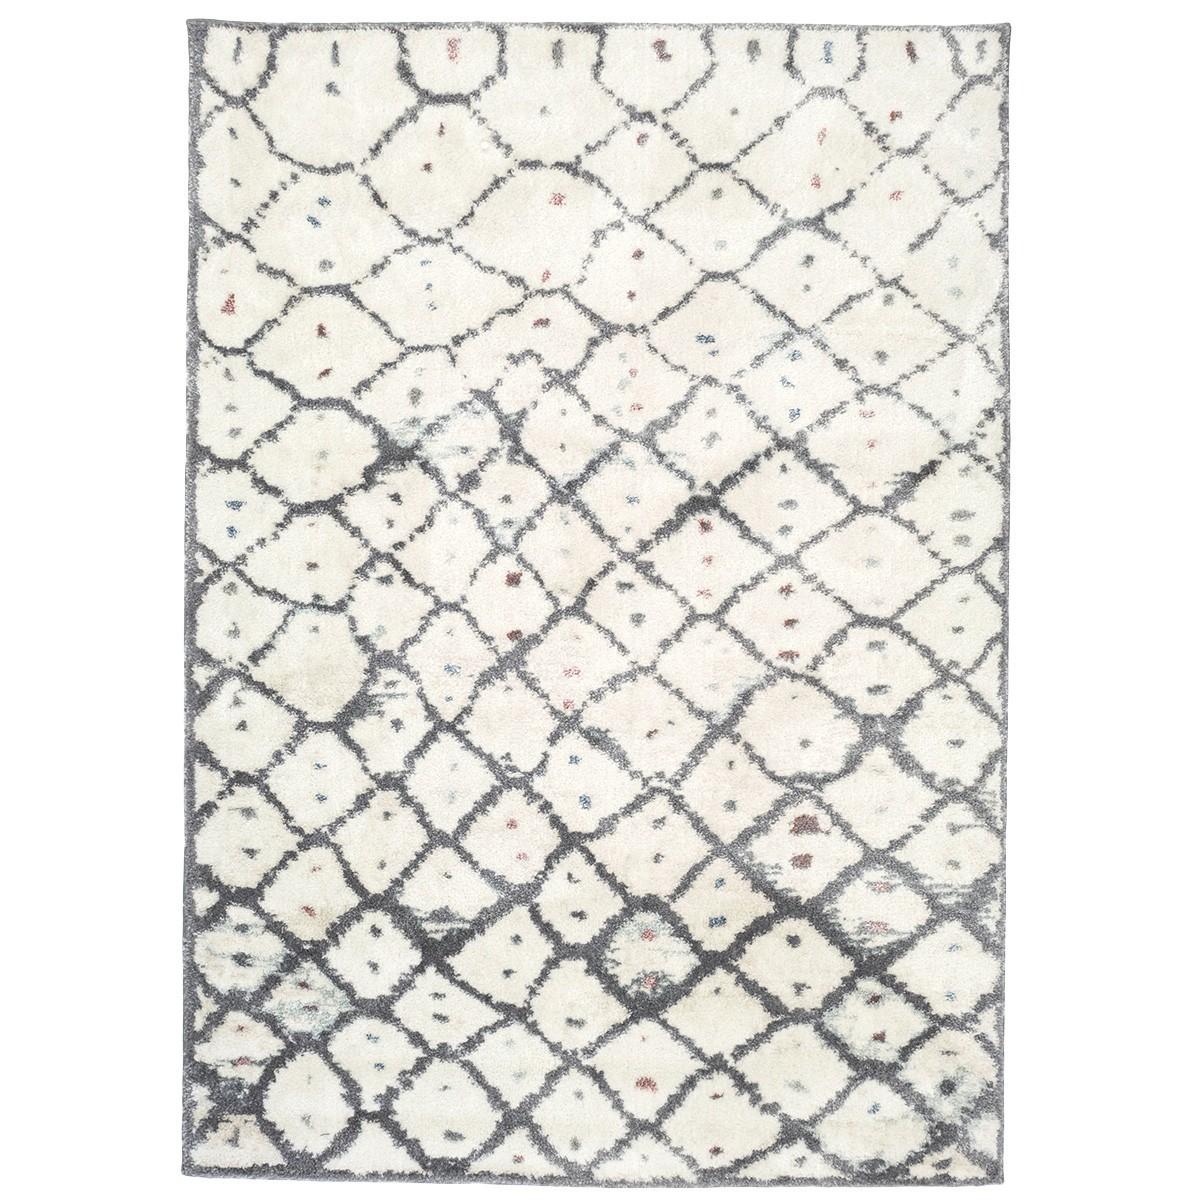 Soho Diamond Modern Rug, 335x235cm